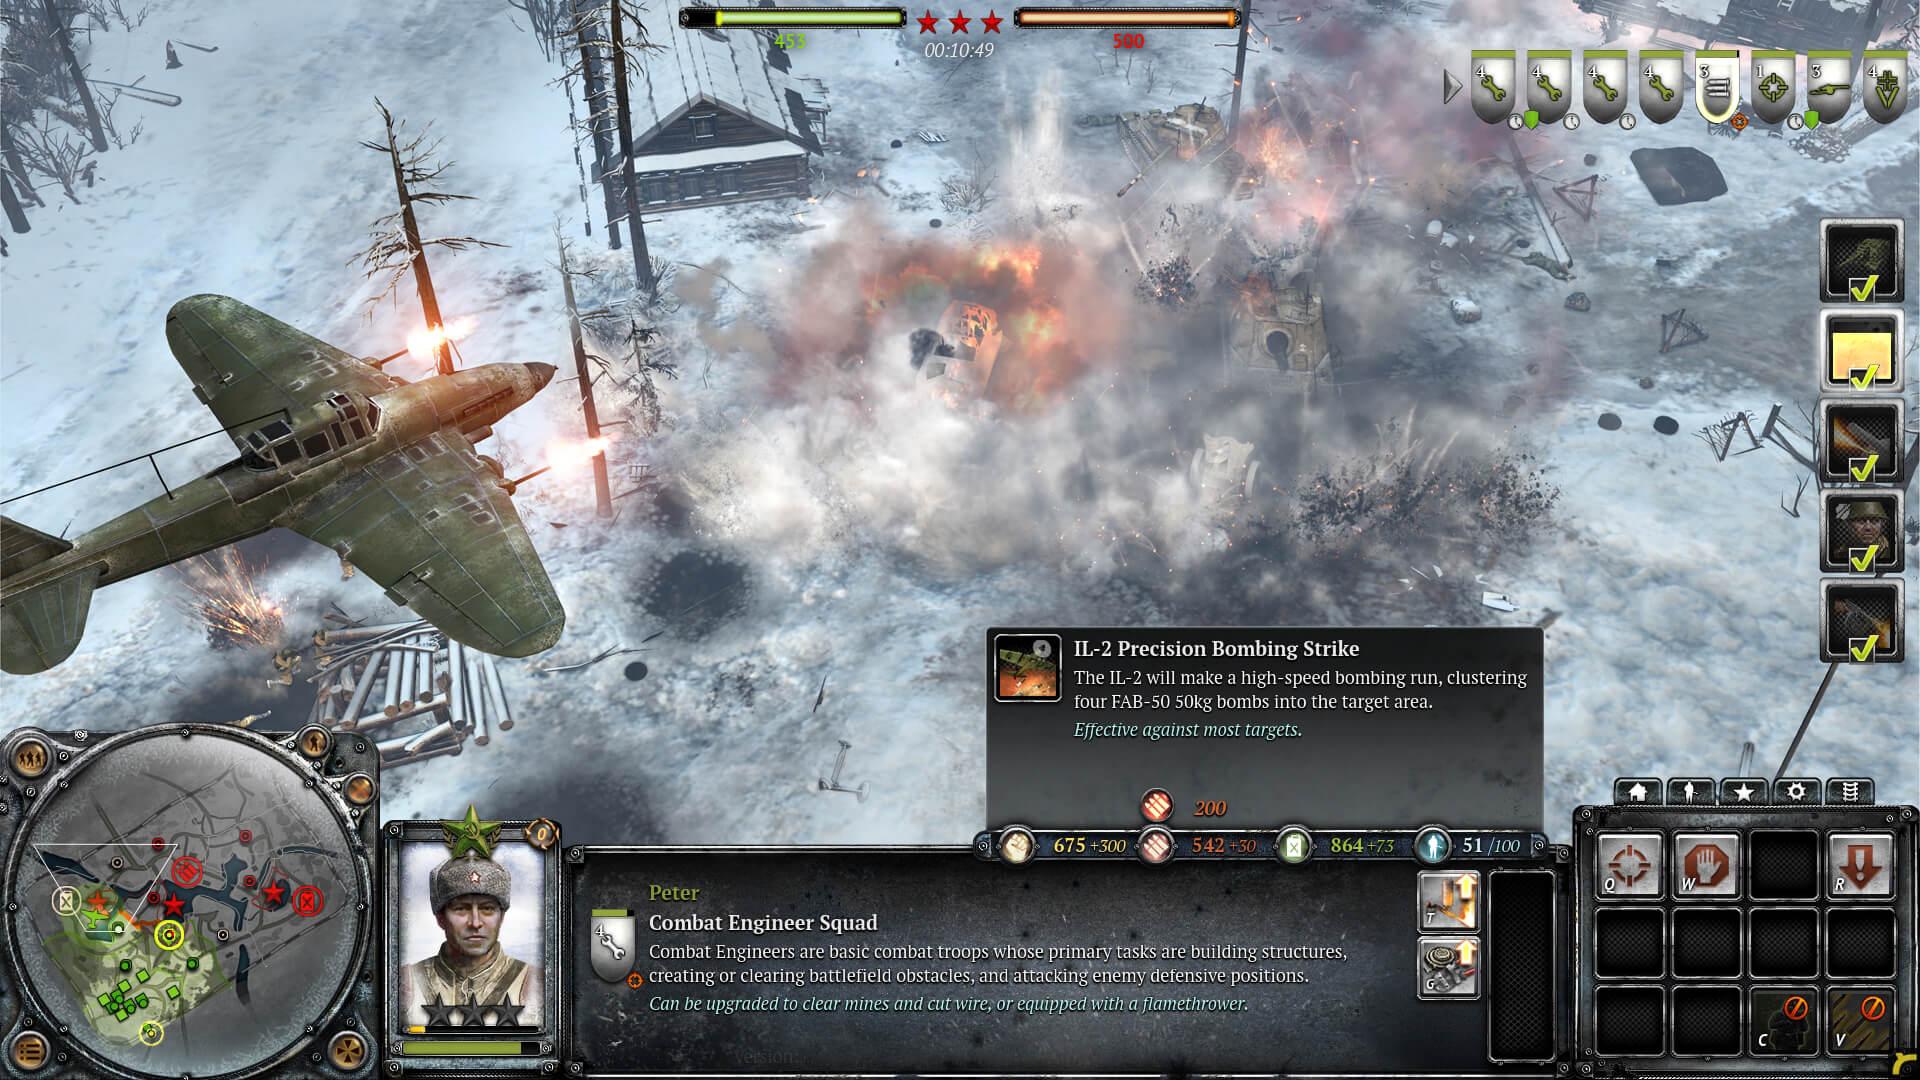 Company of Heroes 2 (Bildrechte: Feral Interactive)